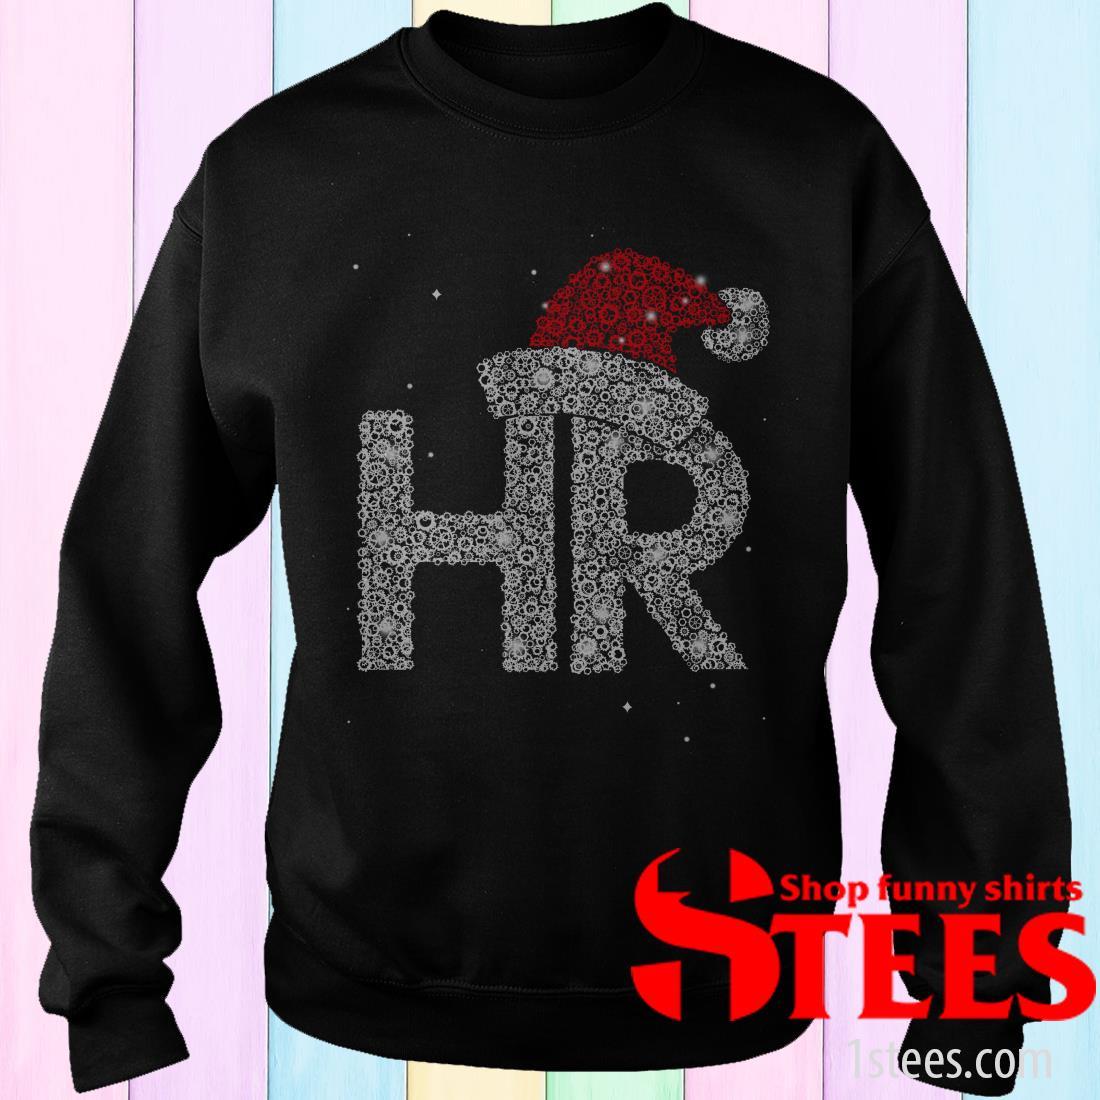 Santa HR Human Resources Diamond Christmas Sweatshirt